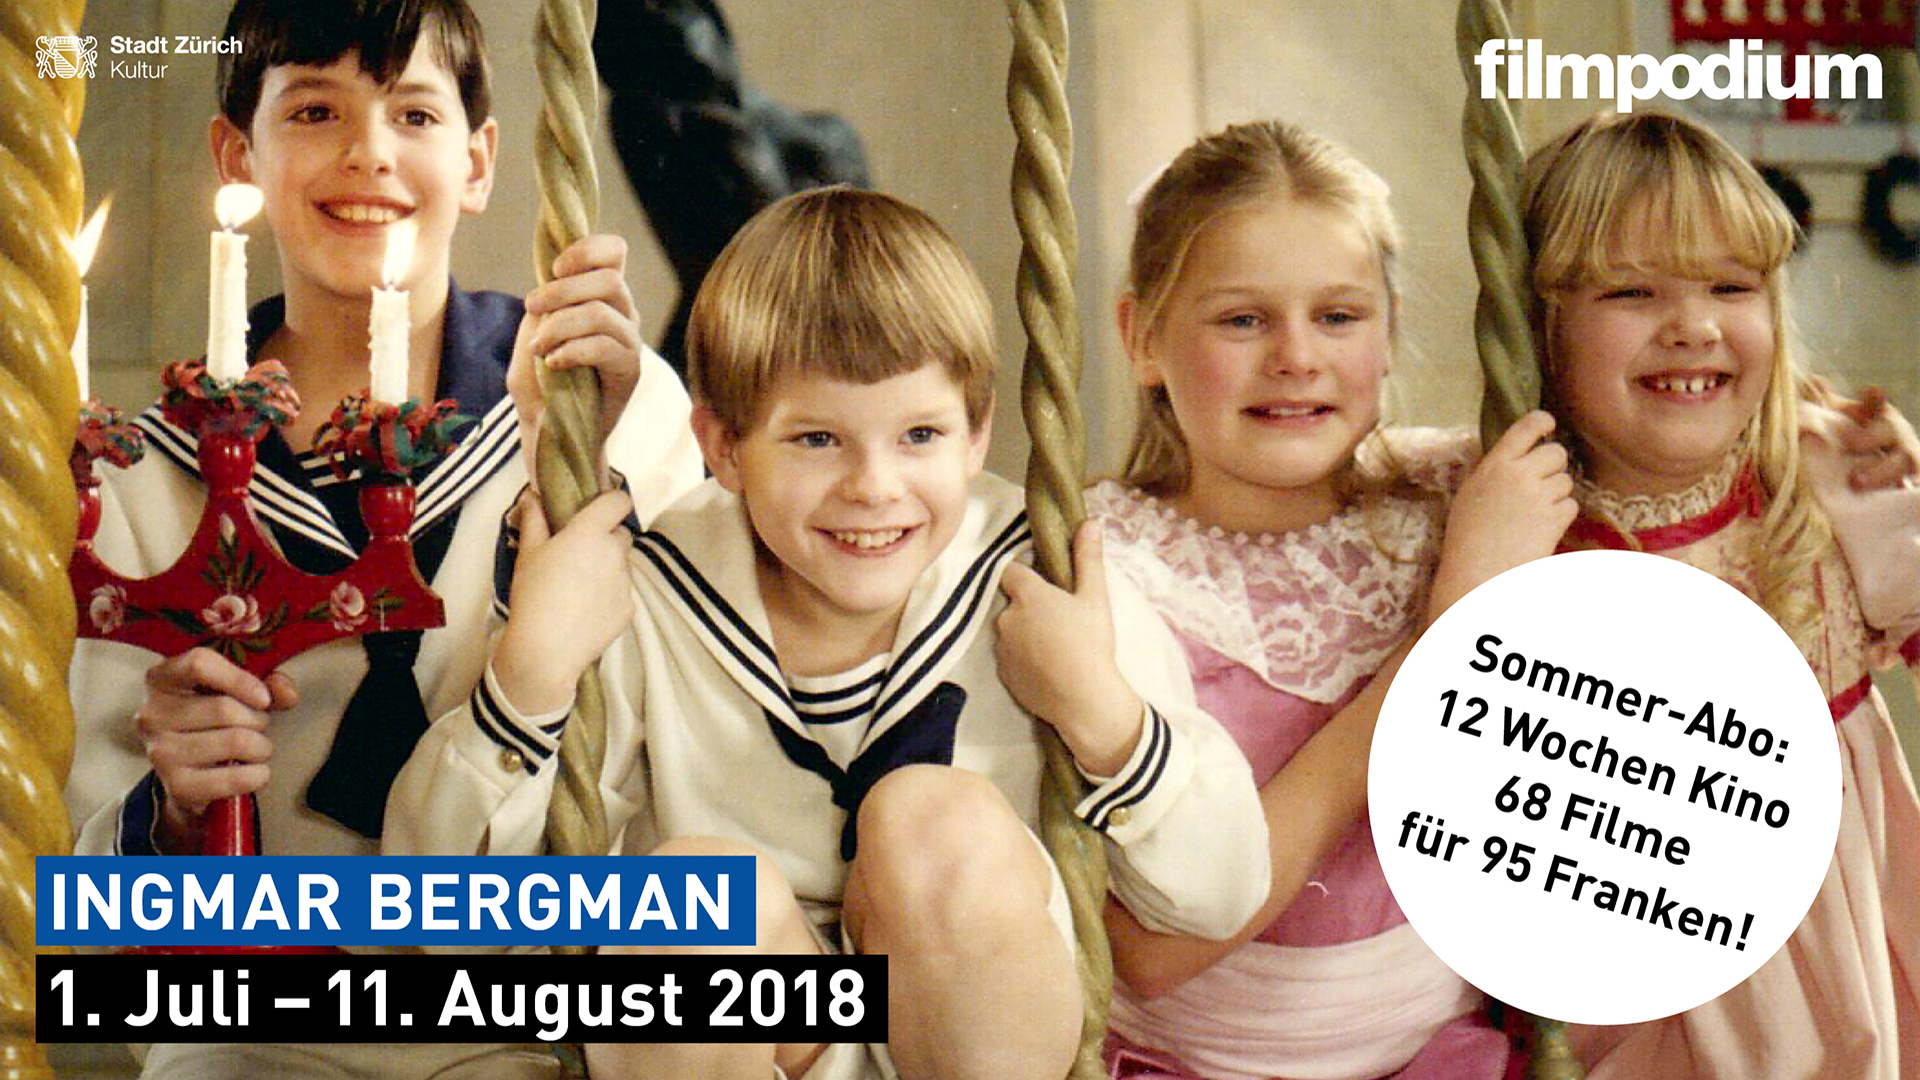 Dia_Ingmar_Bergman_1920x1080